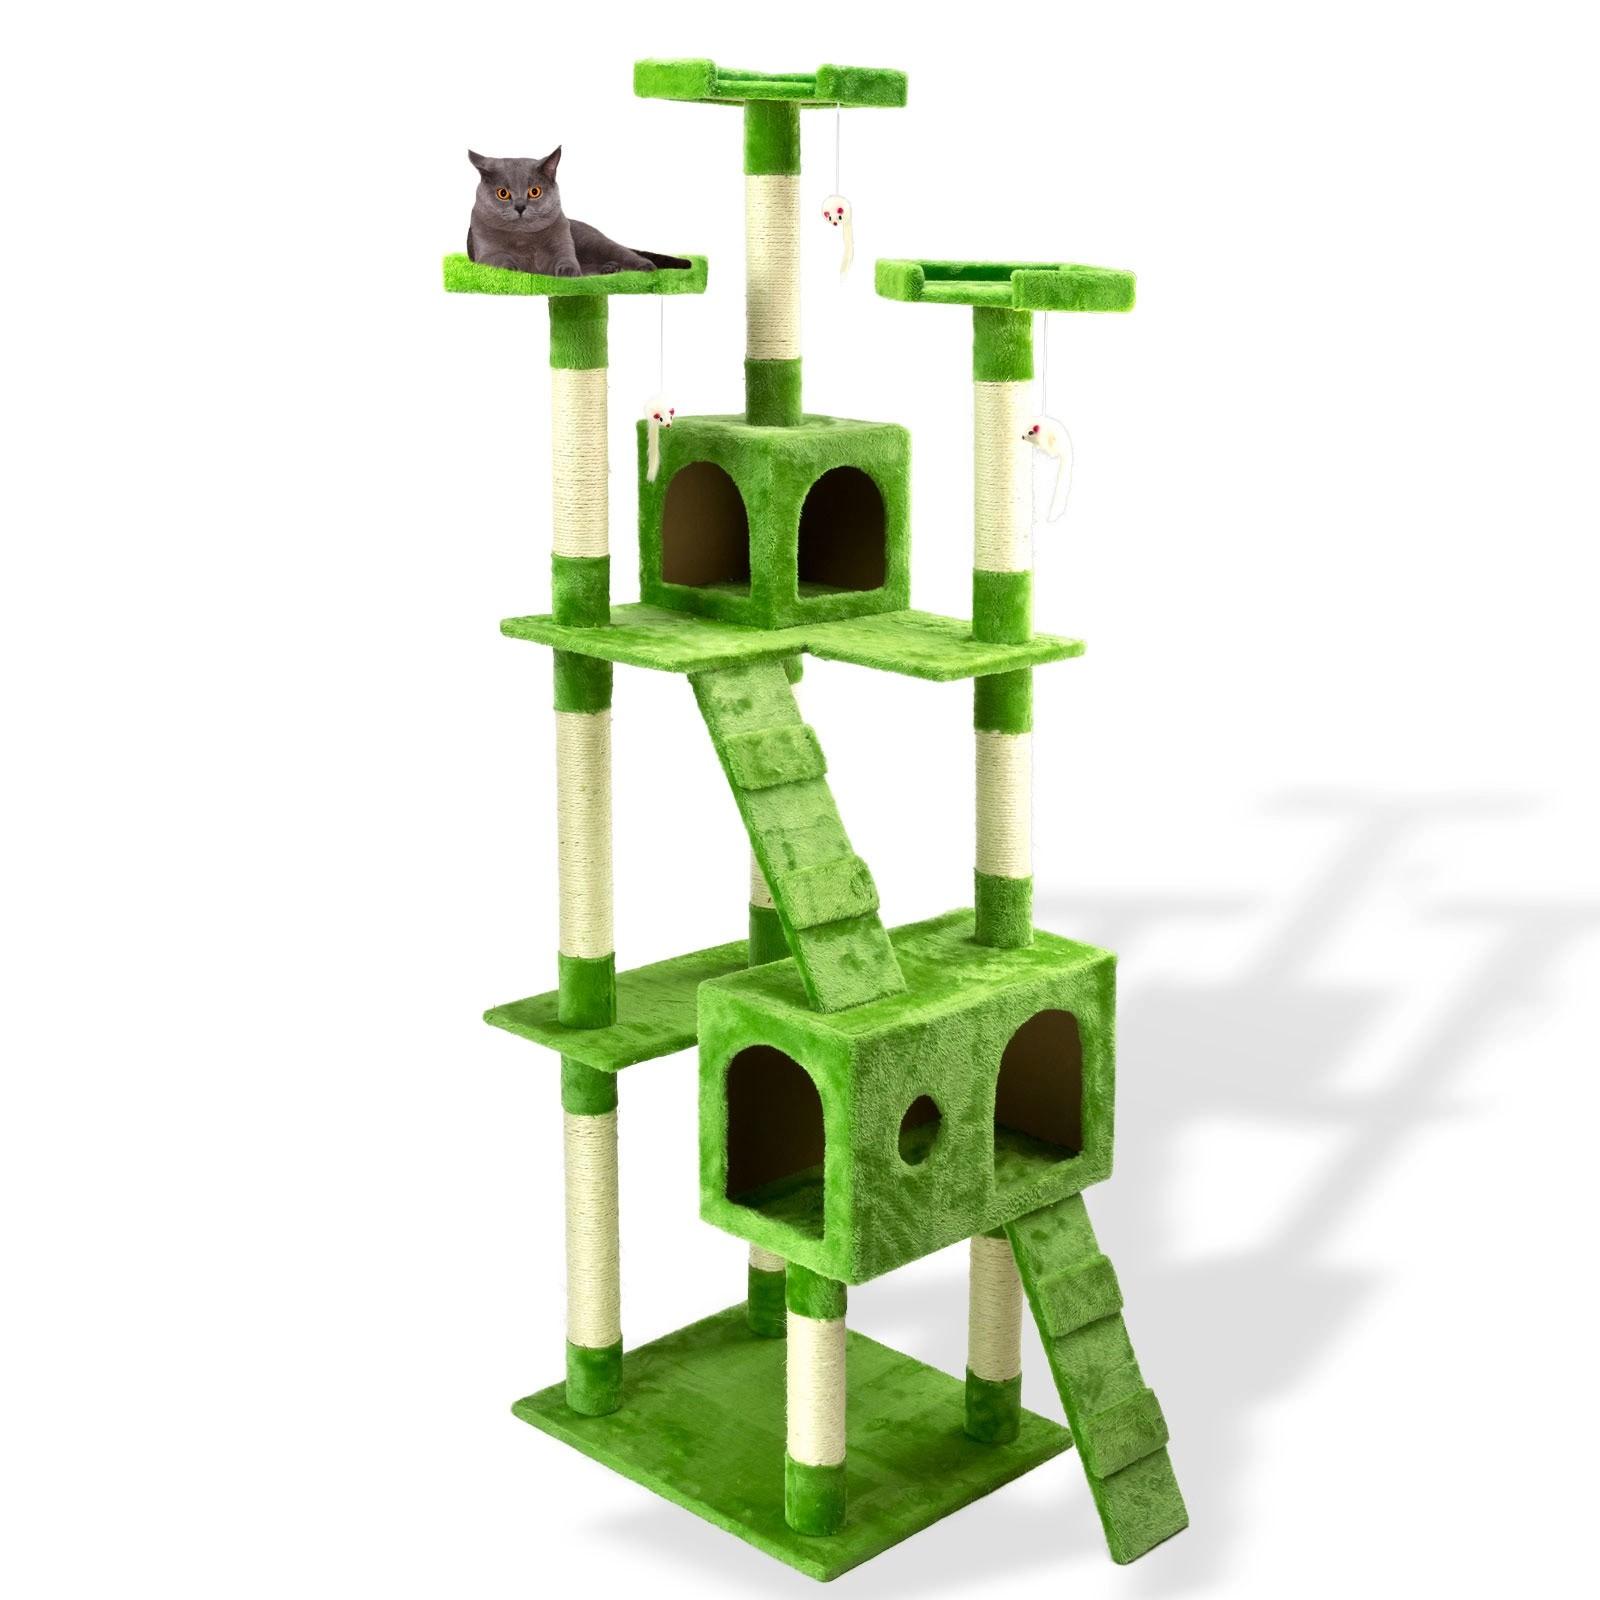 katzen kratzbaum katzenbaum gr n 180 cm. Black Bedroom Furniture Sets. Home Design Ideas